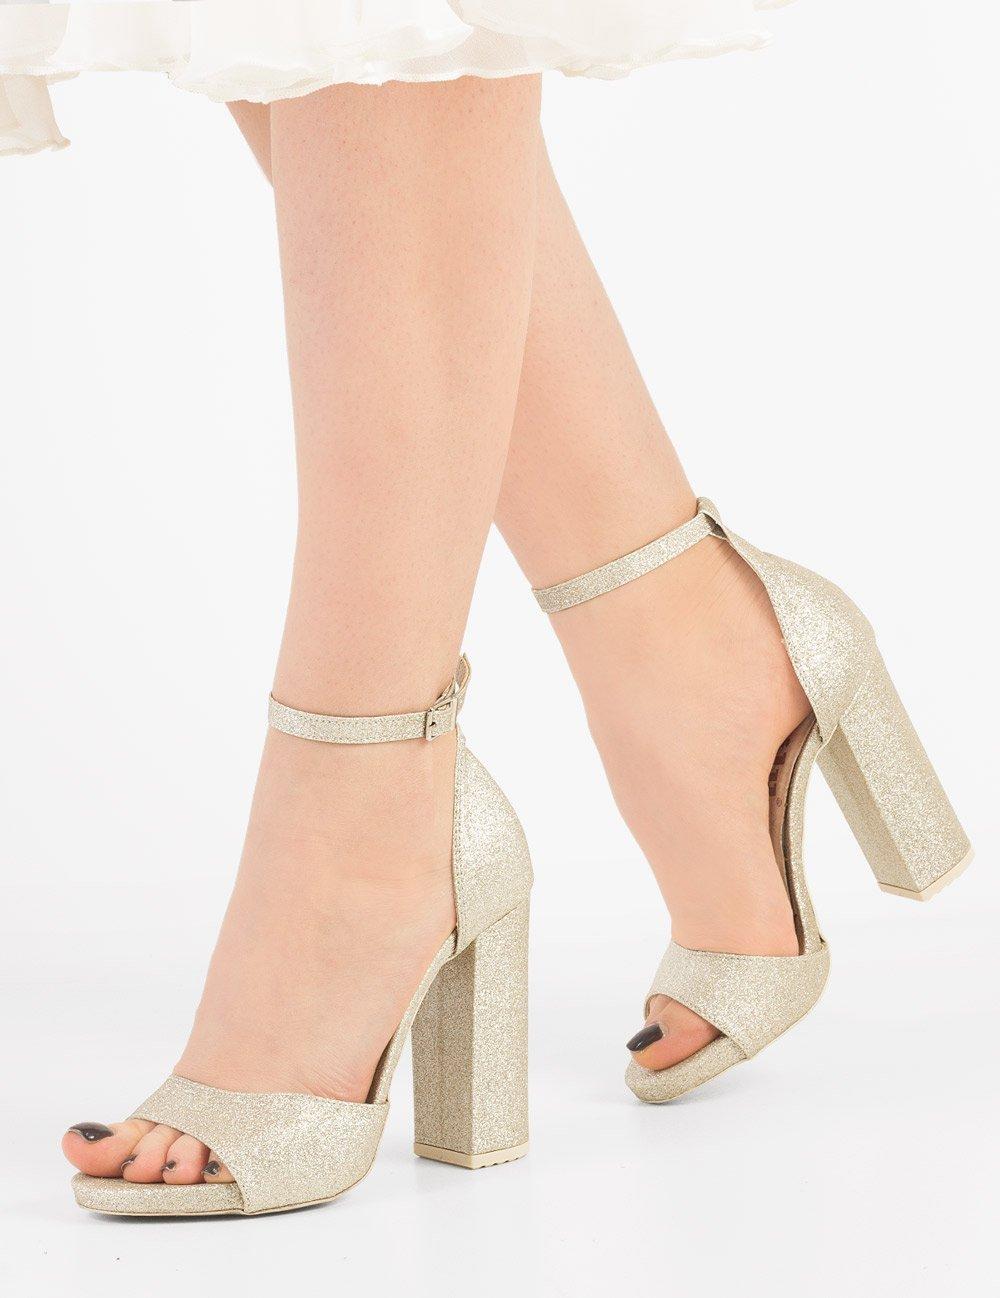 sandały na małej platformie z obcasem